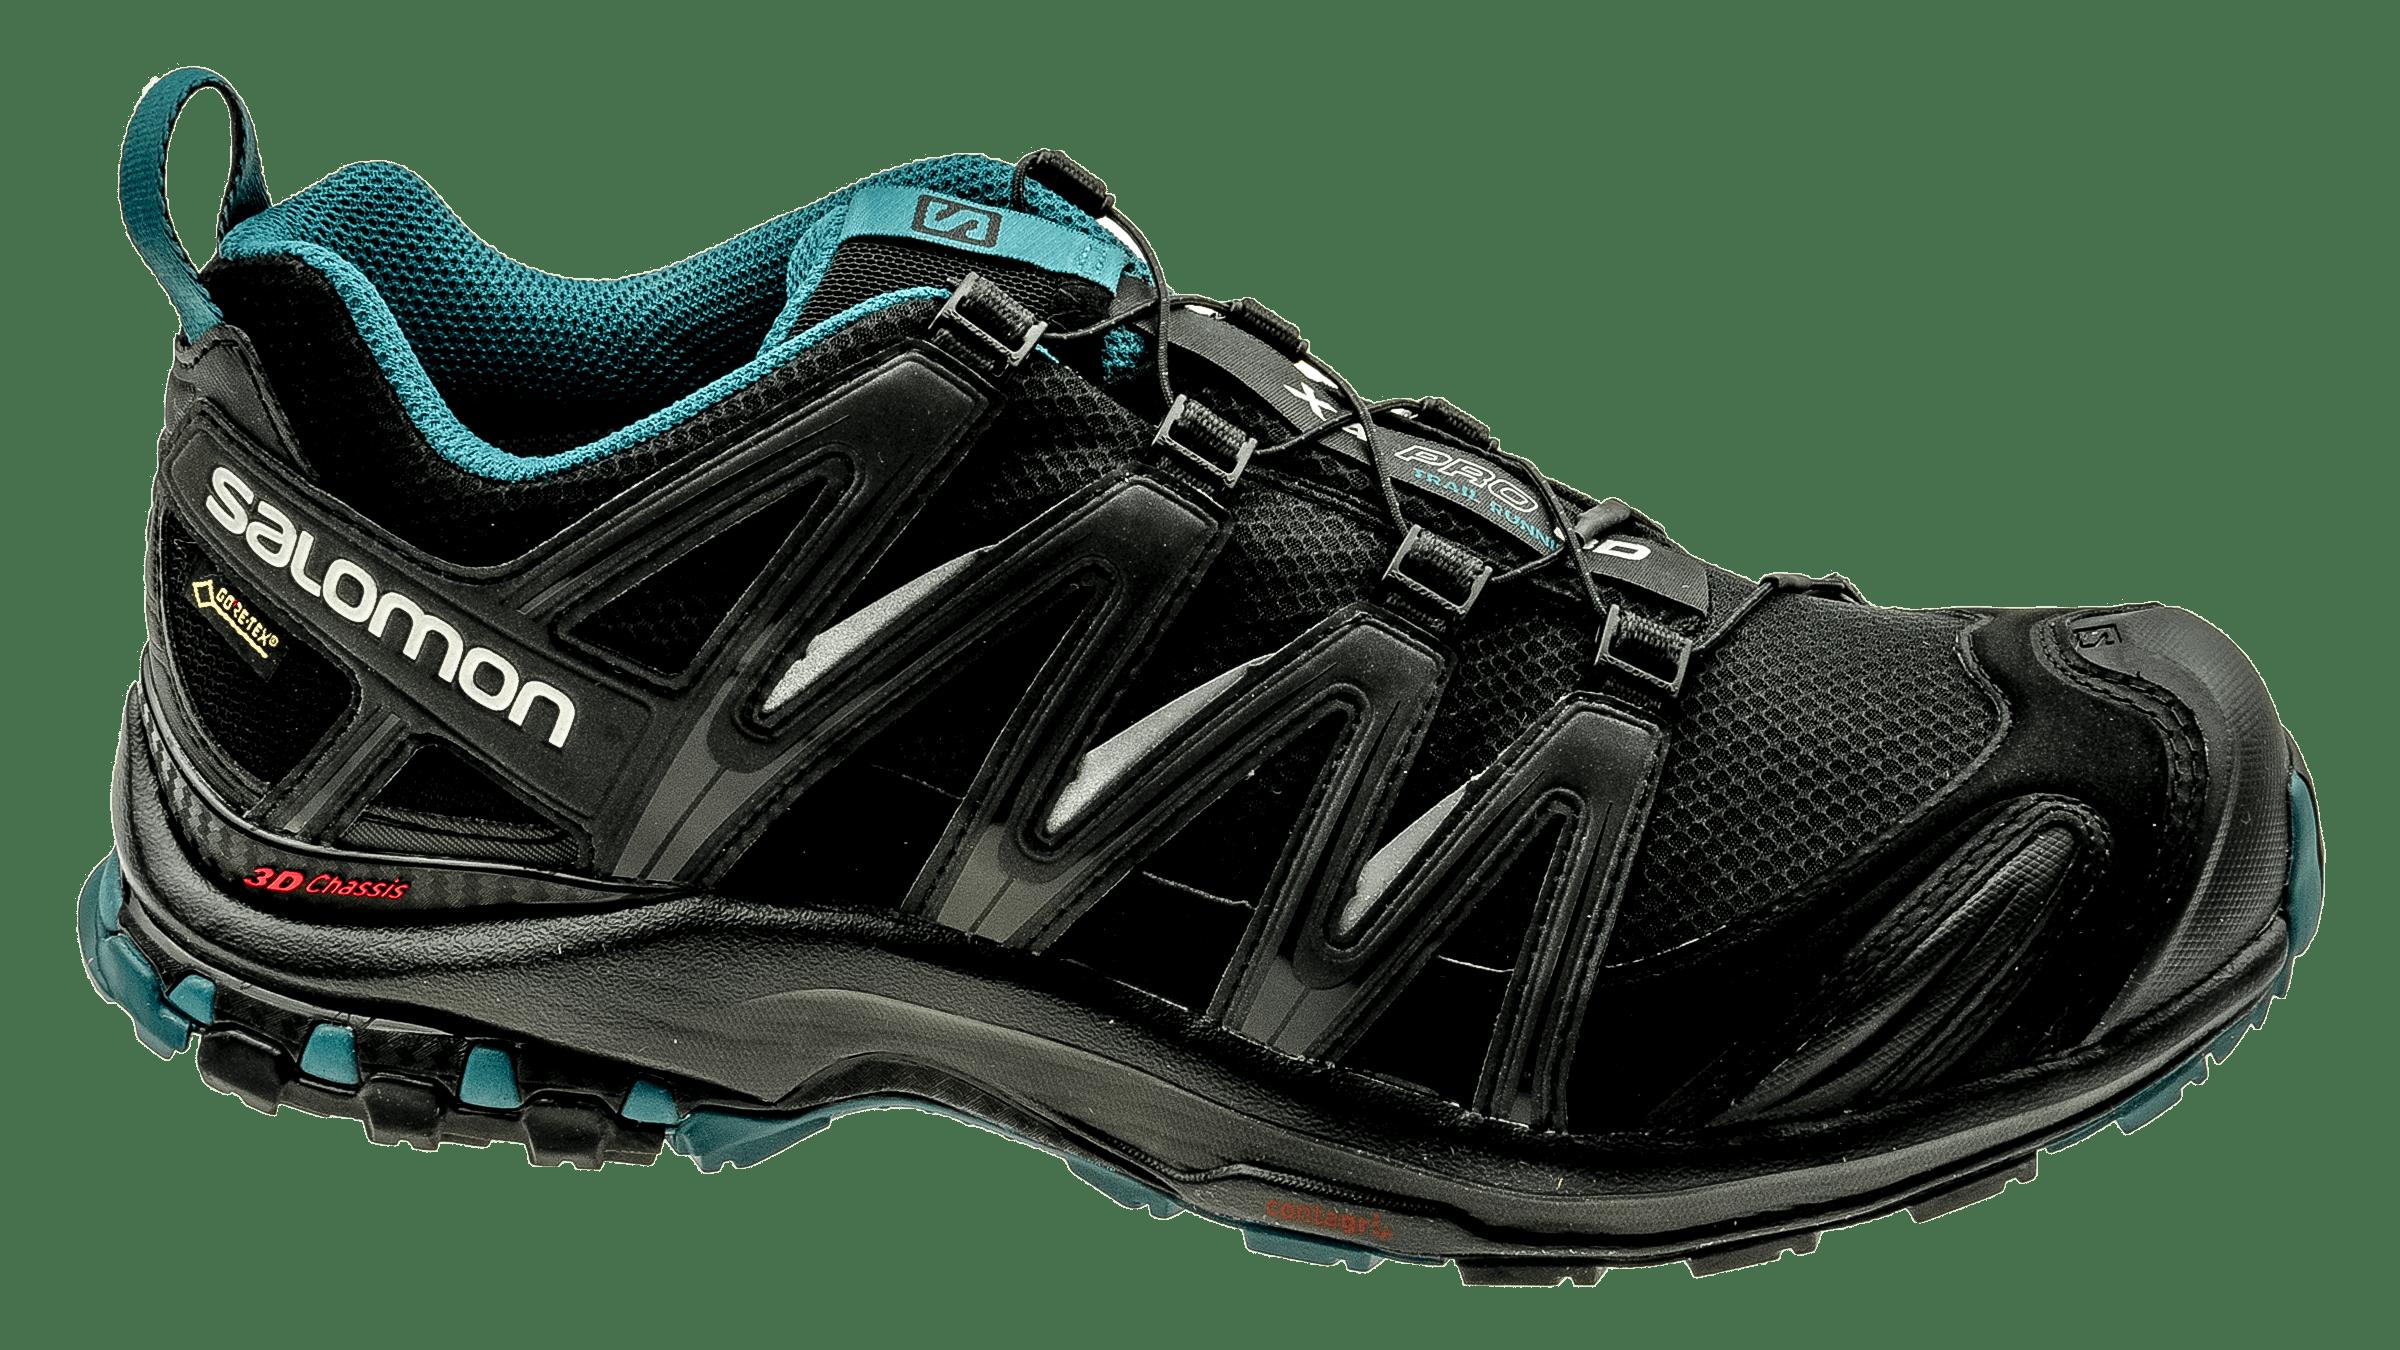 7f325e0f0667 Salomon Unisex XA Pro 3D GTX NOCTURNE black mallard blue bestellen ...